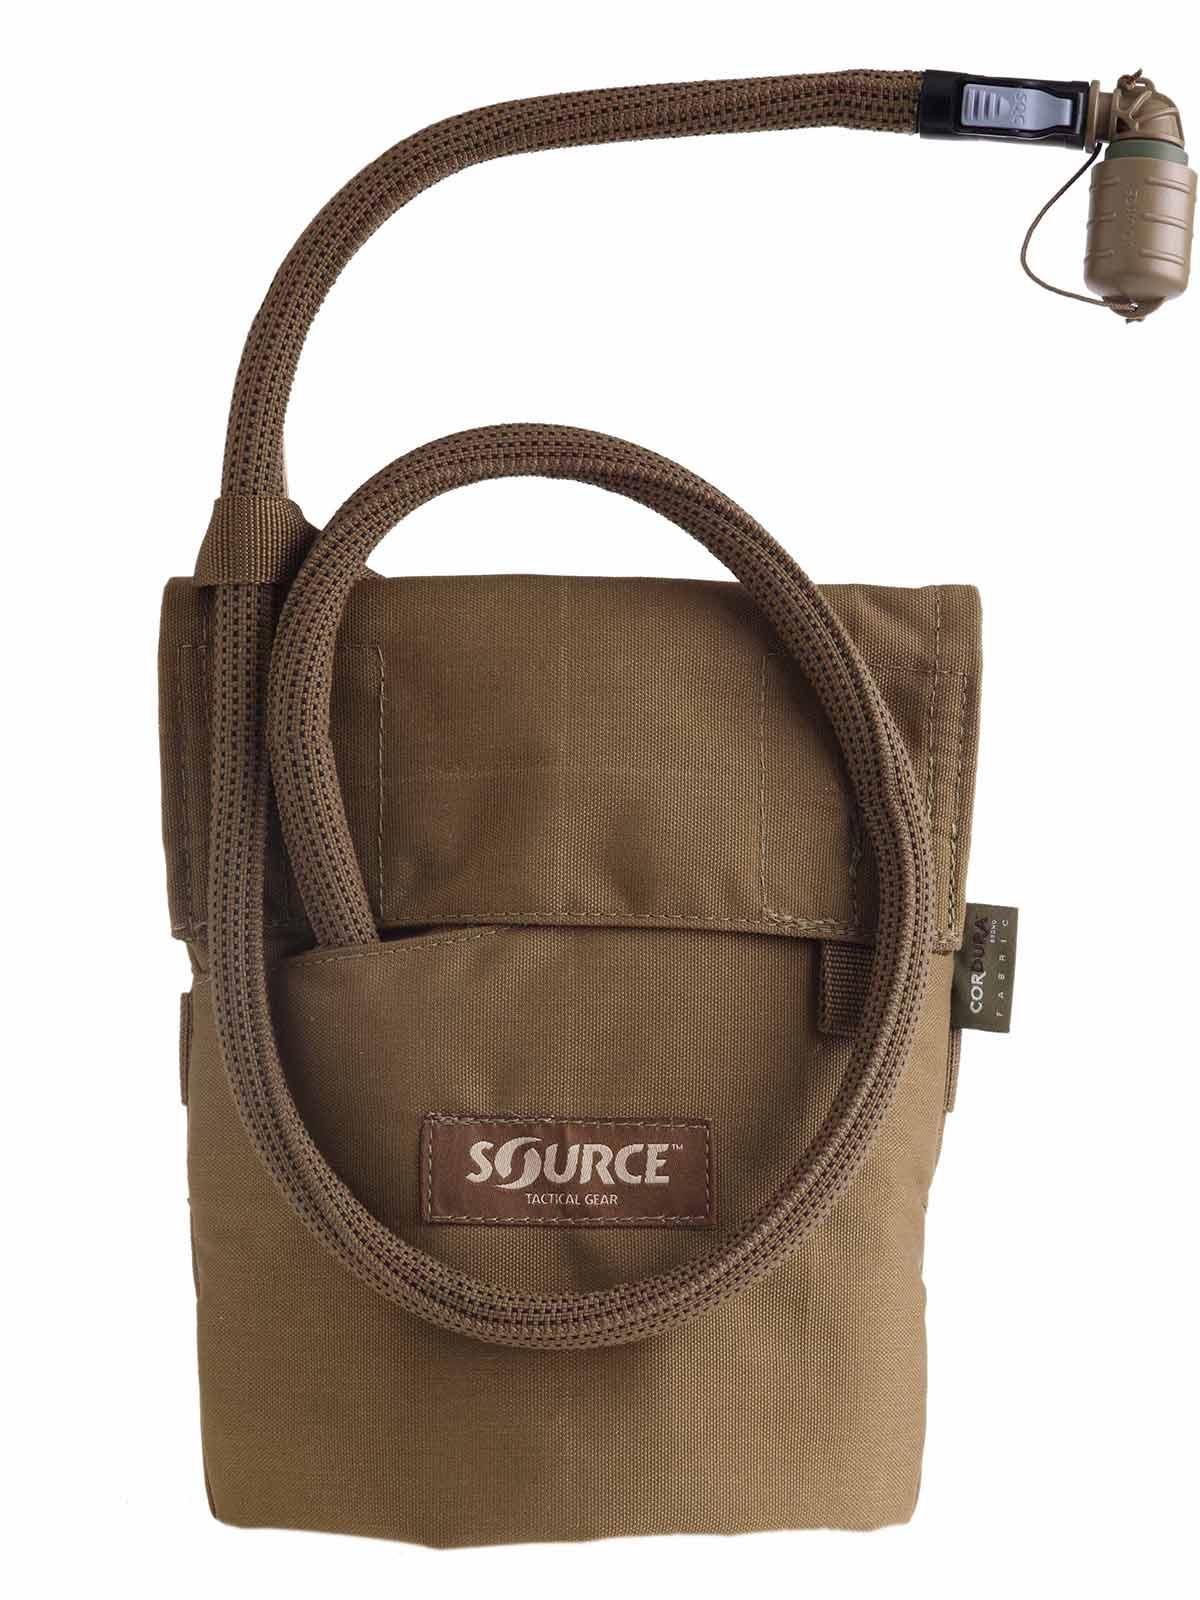 Source Kangaroo 1l auspiciador pouch